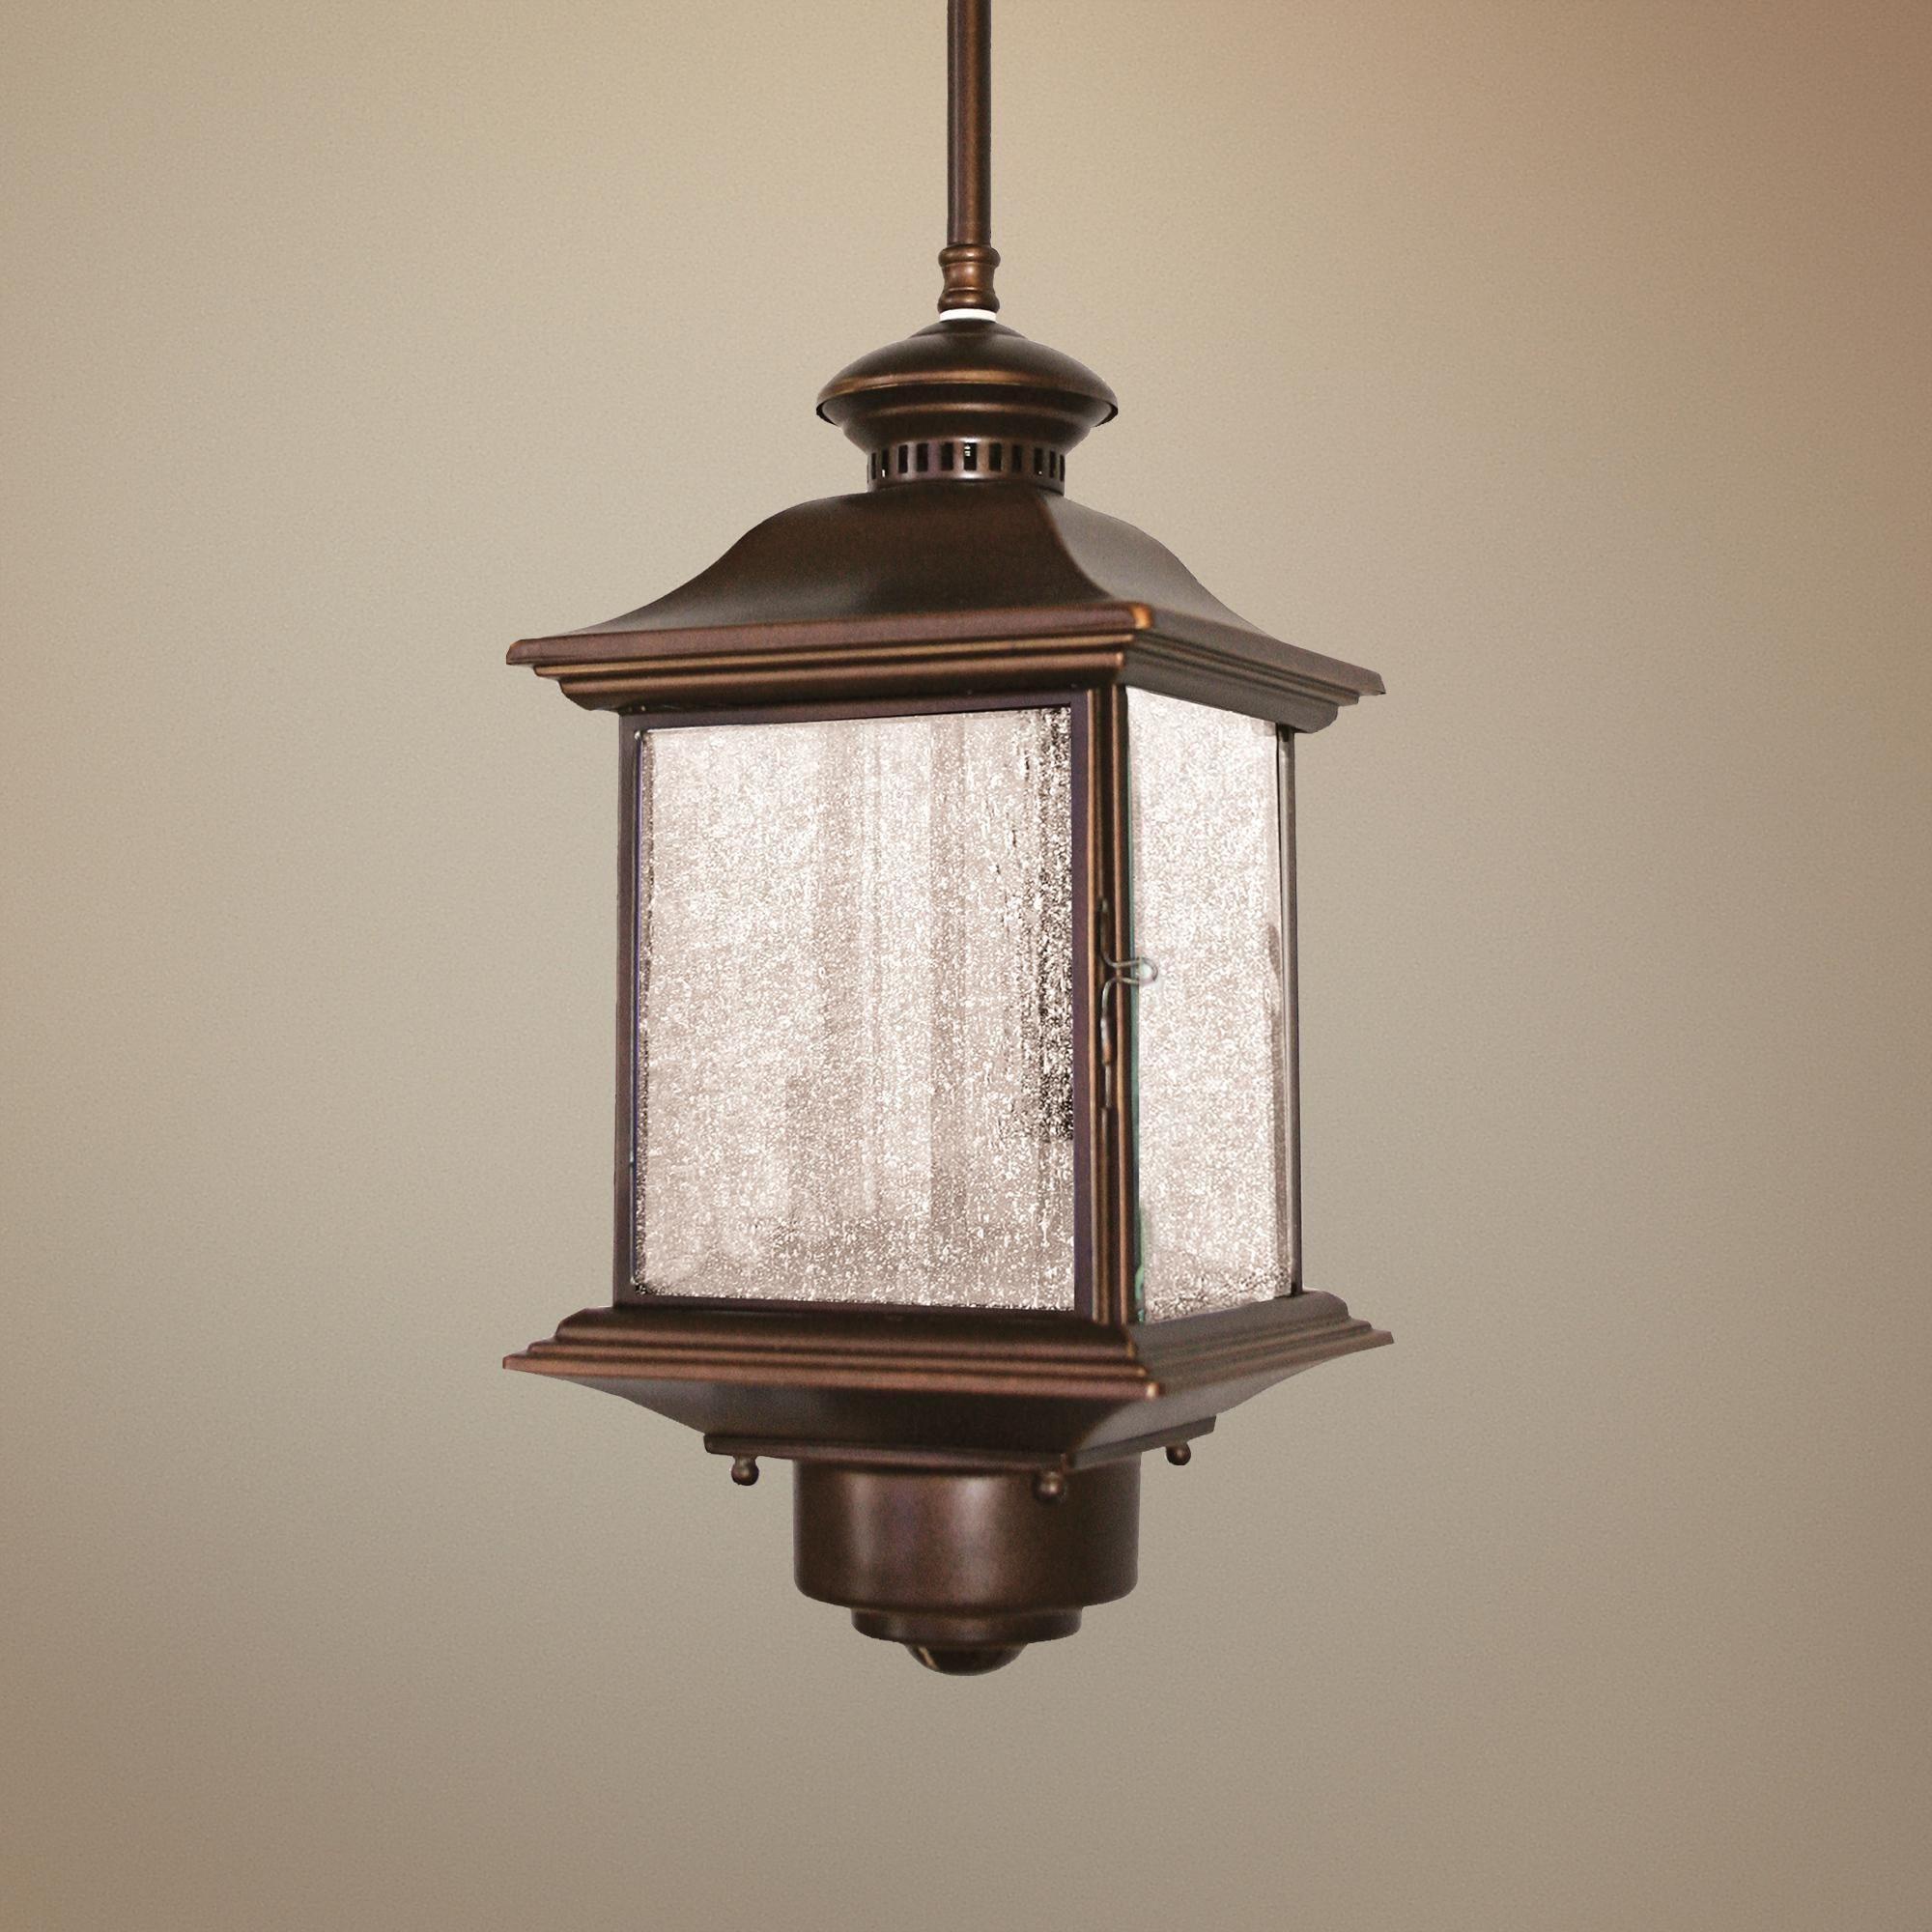 Motion Sensor 14 High Antique Bronze Outdoor Hanging Light 88248 Lamps Plus Outdoor Hanging Light Hanging Lights Lamps Plus